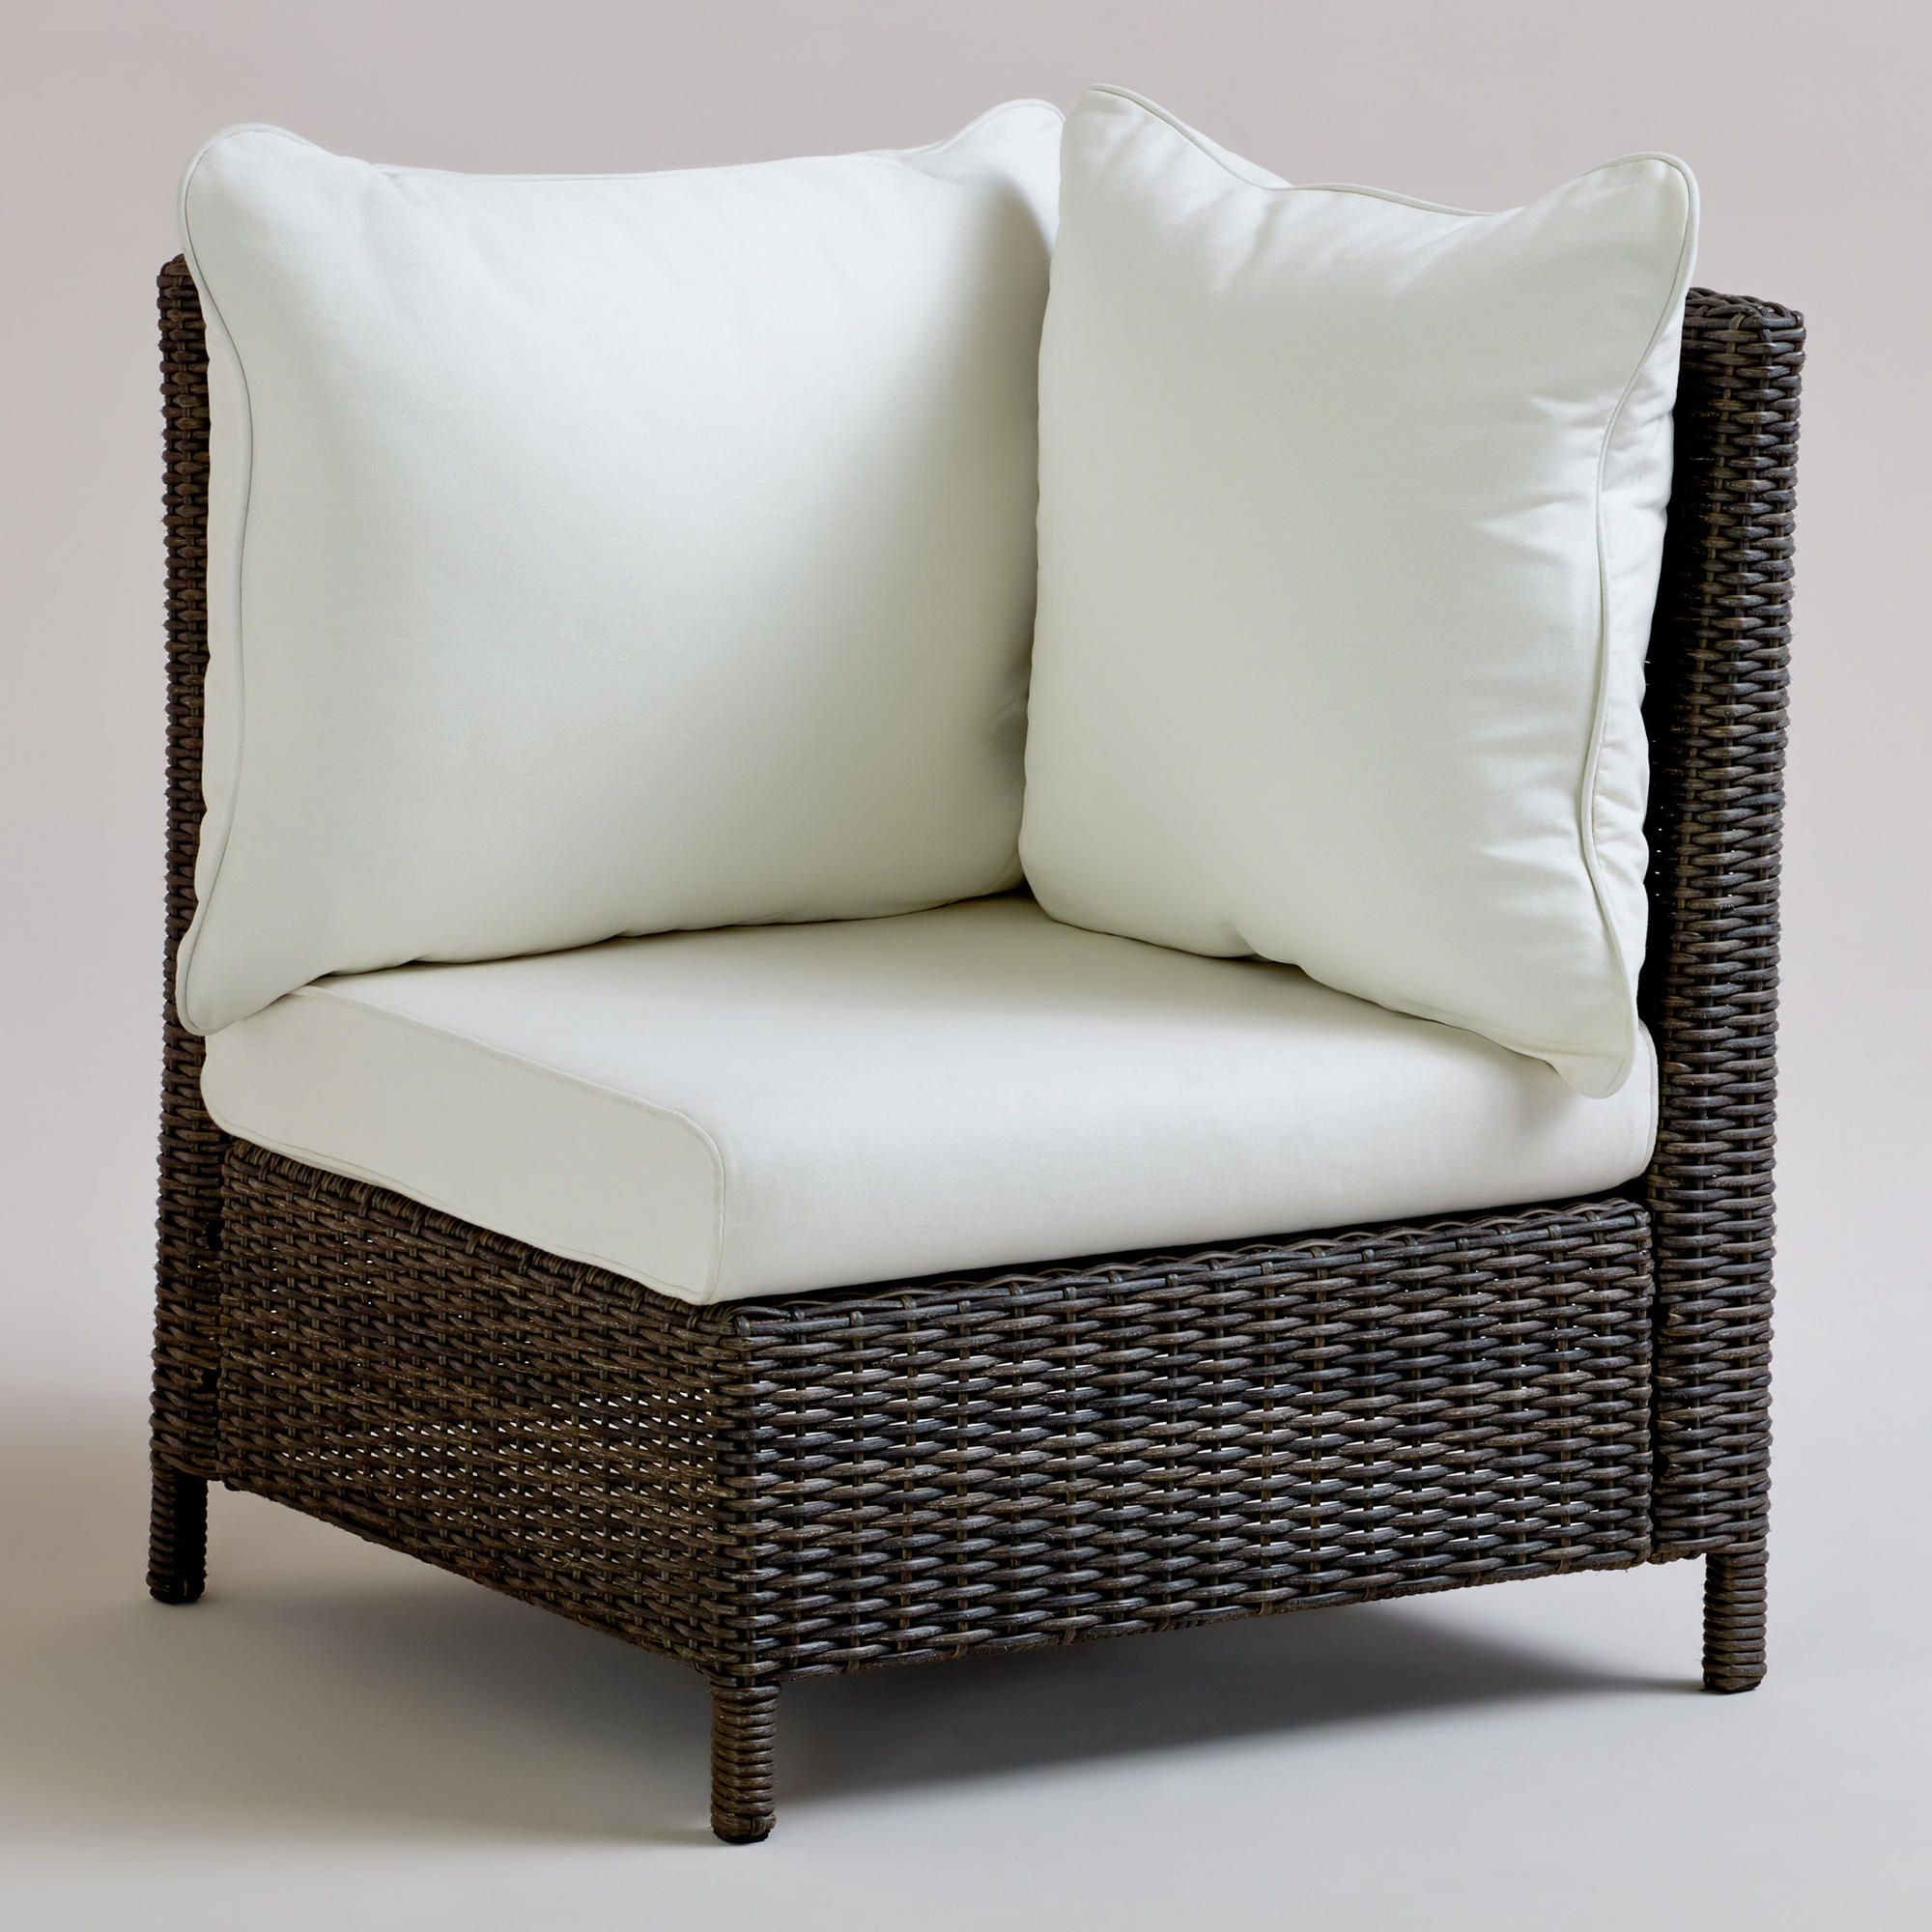 Park Art|My WordPress Blog_World Market Wicker Chair Cushions